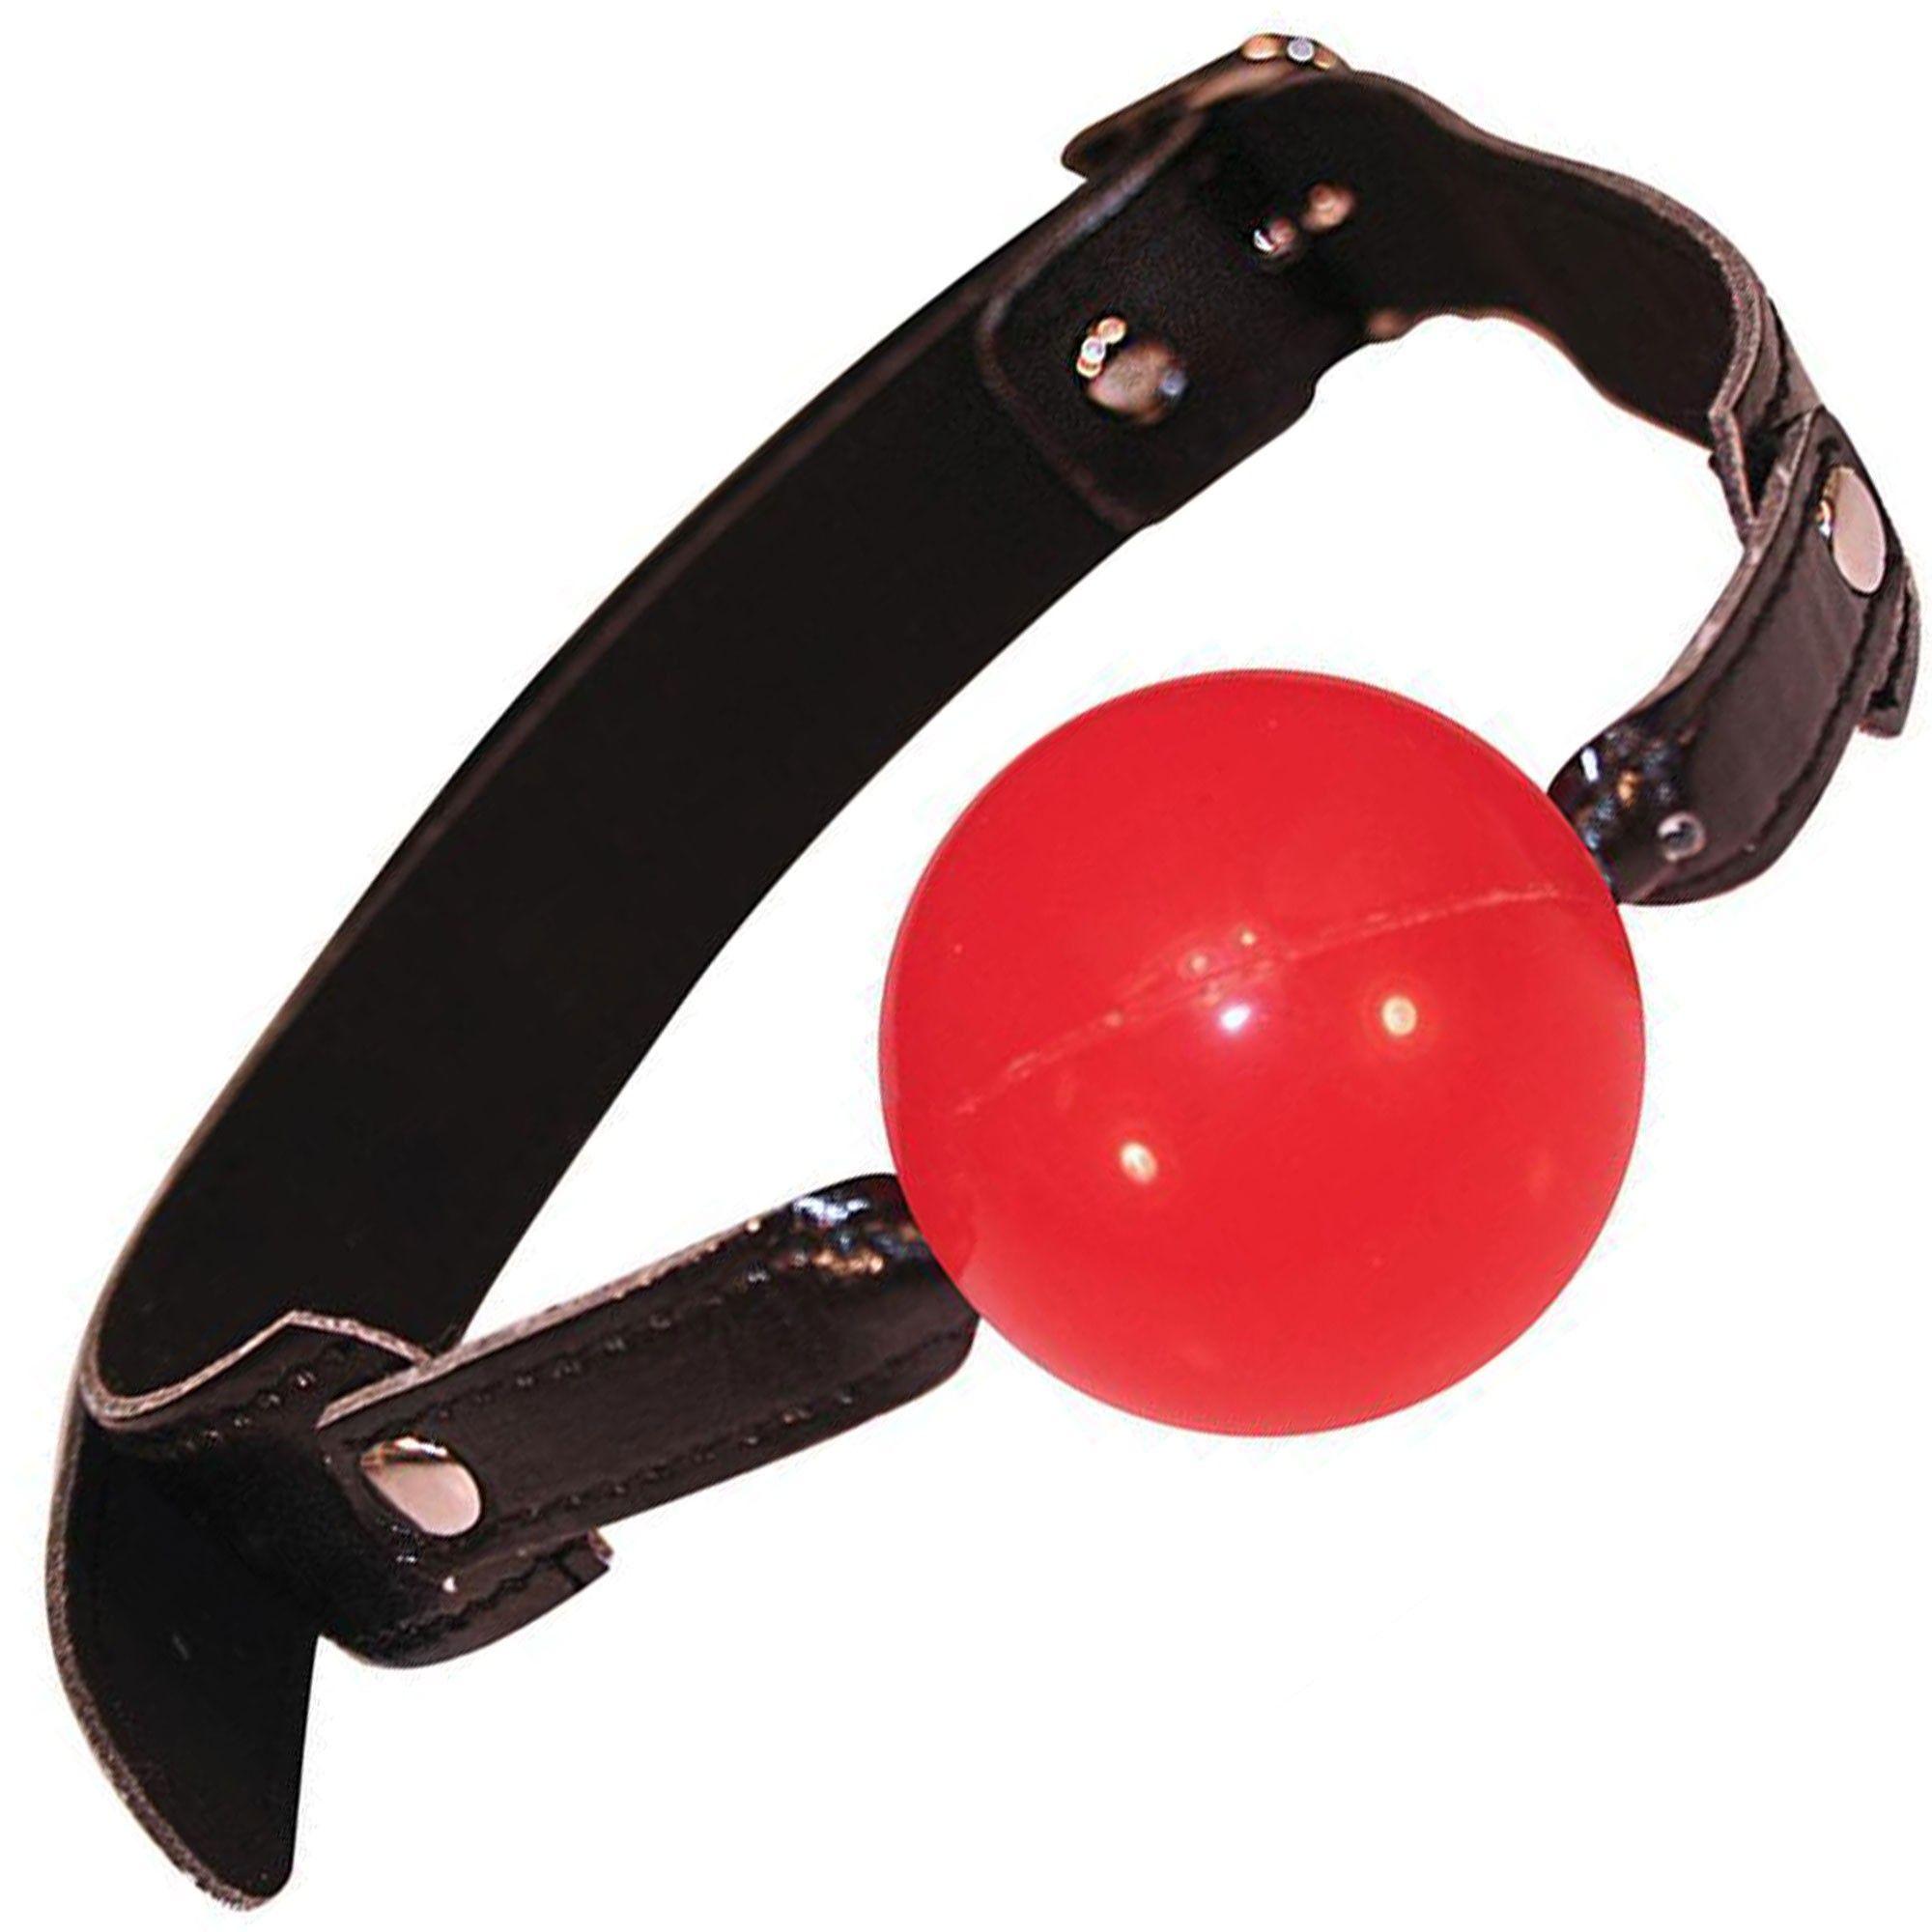 strapless strap on köp sexleksaker